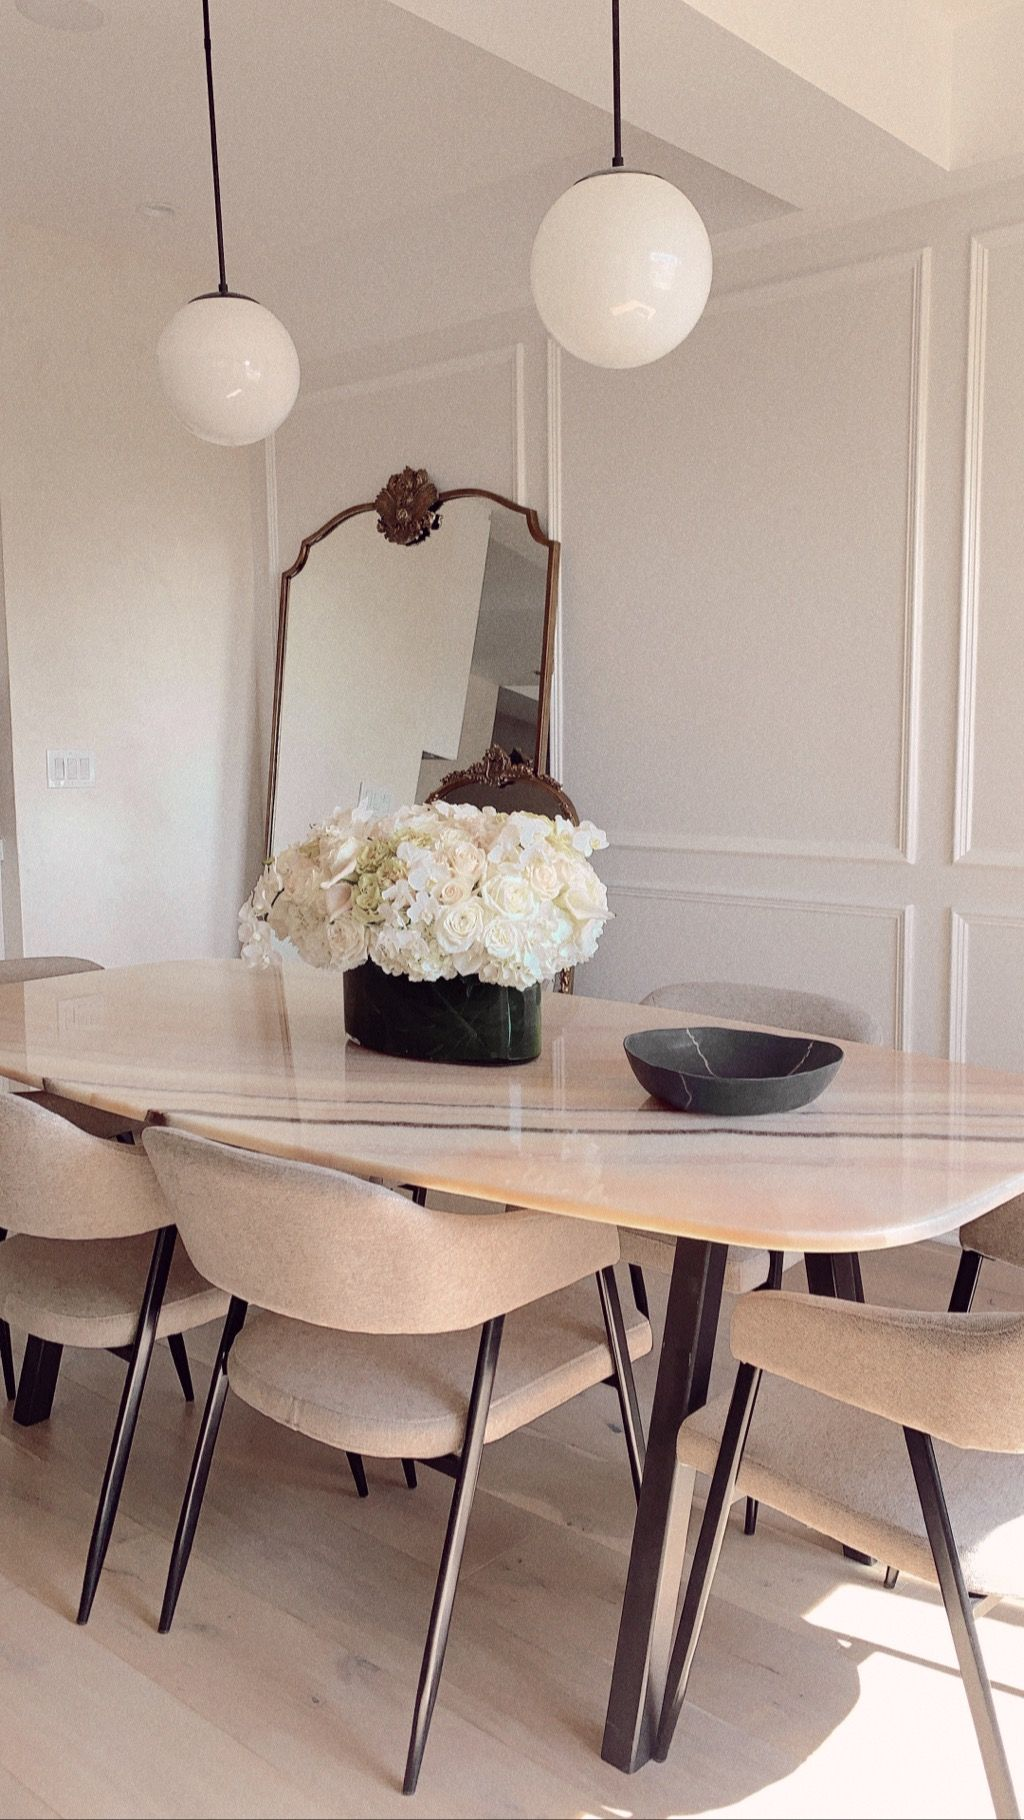 Marianna Hewitt Dining Room Dining Table Marble Dining Room